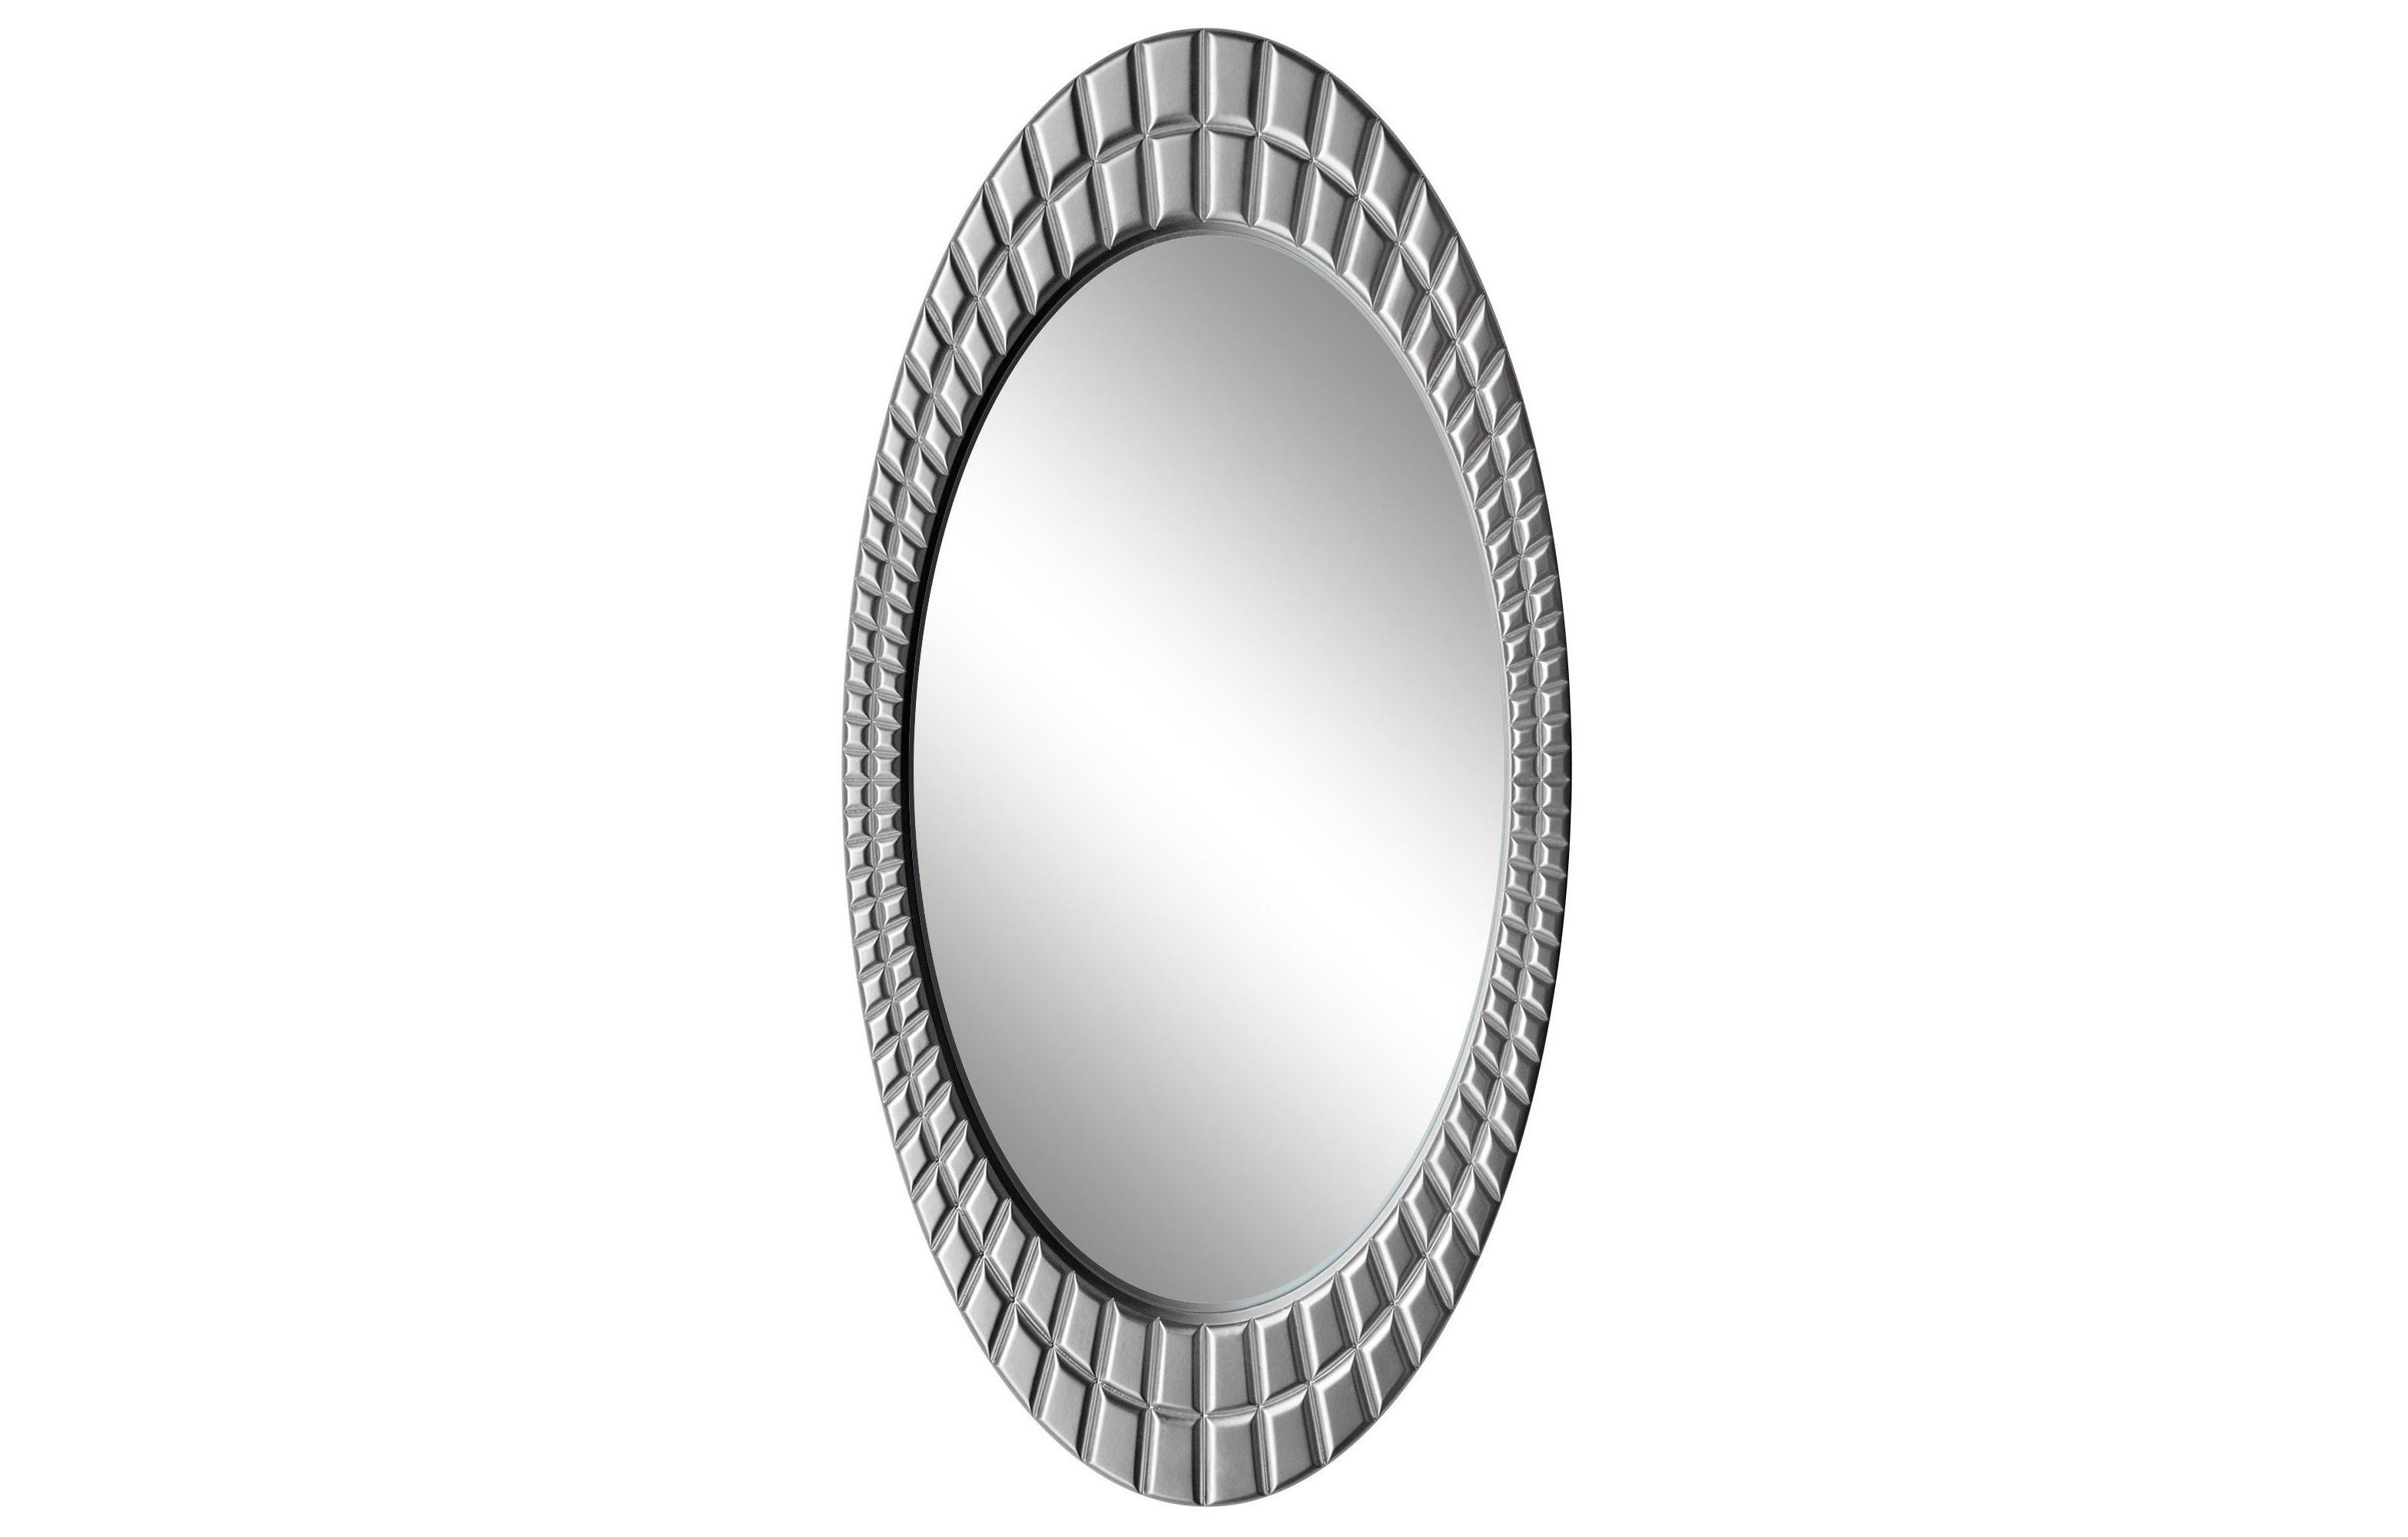 Зеркало Reeforma 15431625 от thefurnish